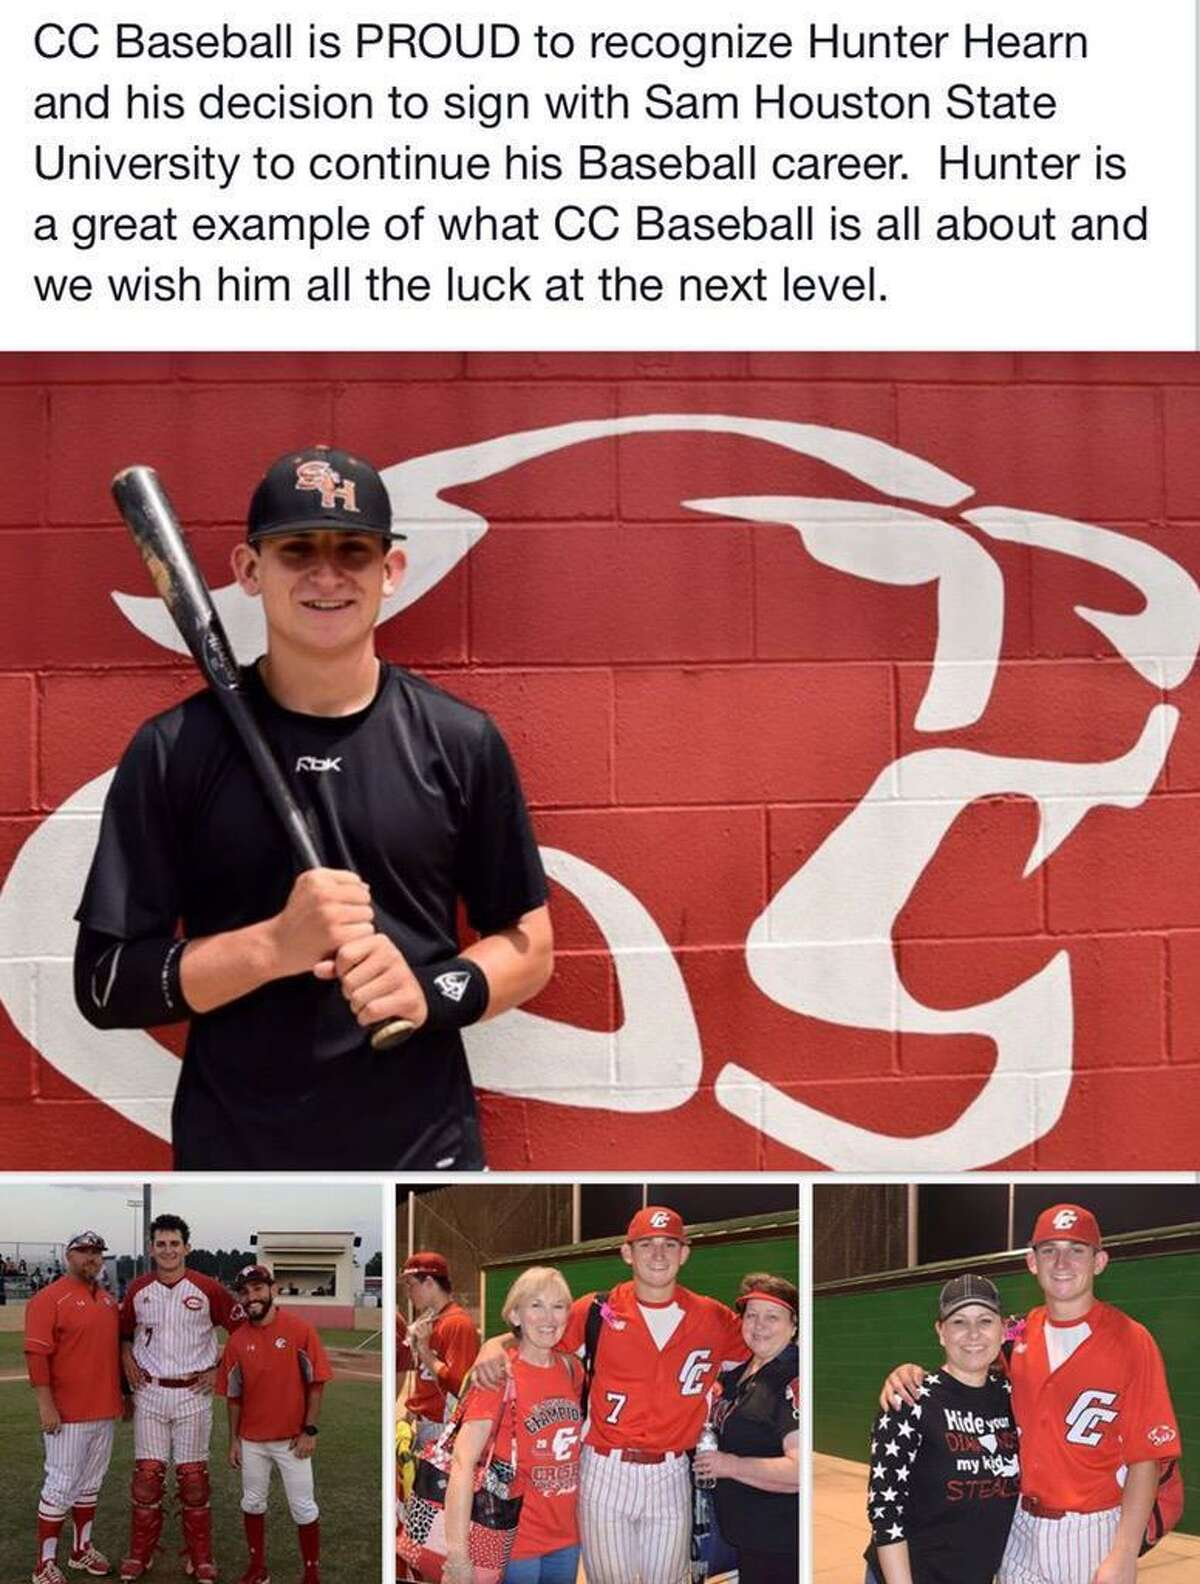 Crosby class of 2015 graduate Hunter Hearn has excelled on the Sam Houston State University Bearkats baseball team